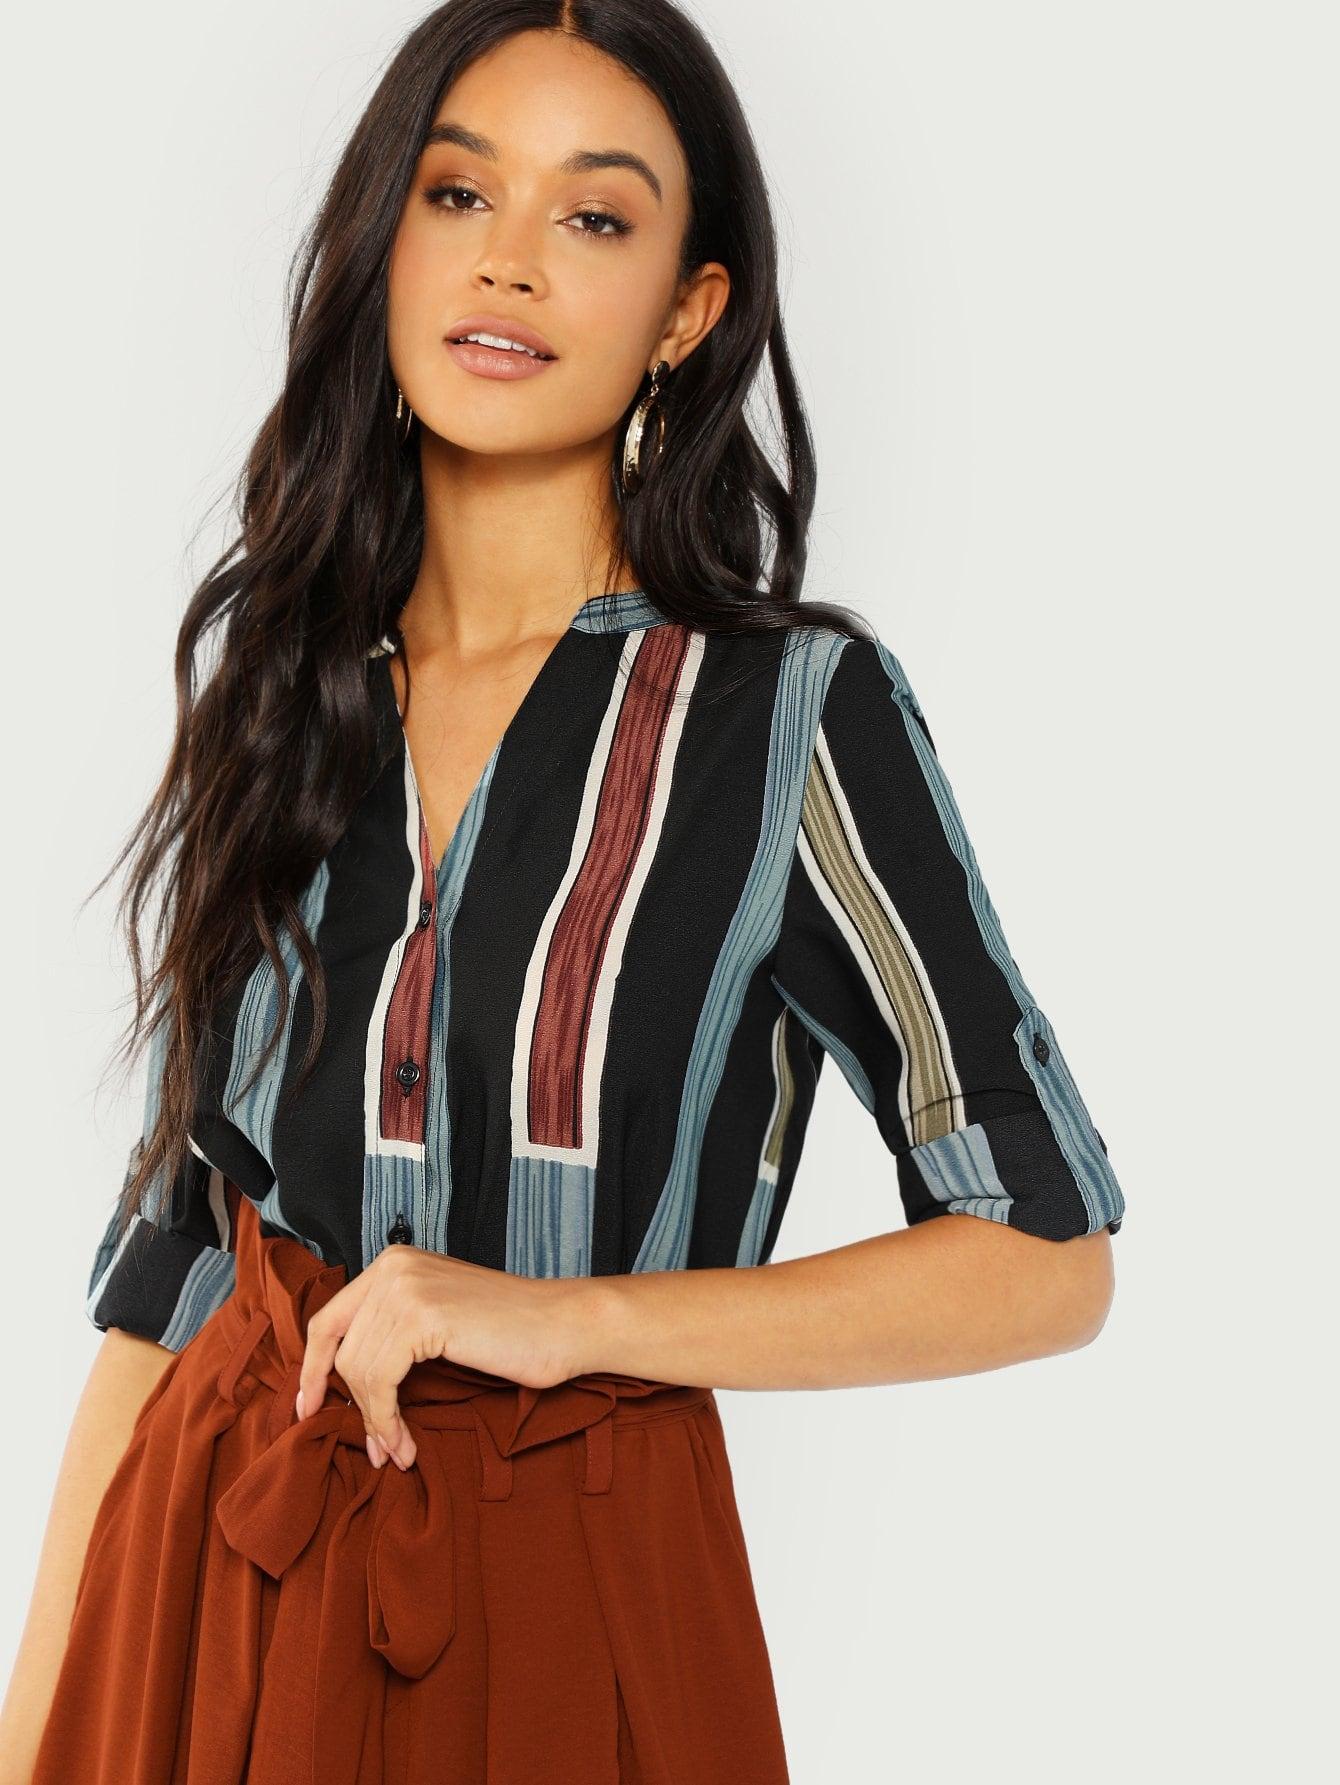 SHEINV Cut Neck Striped Shirt